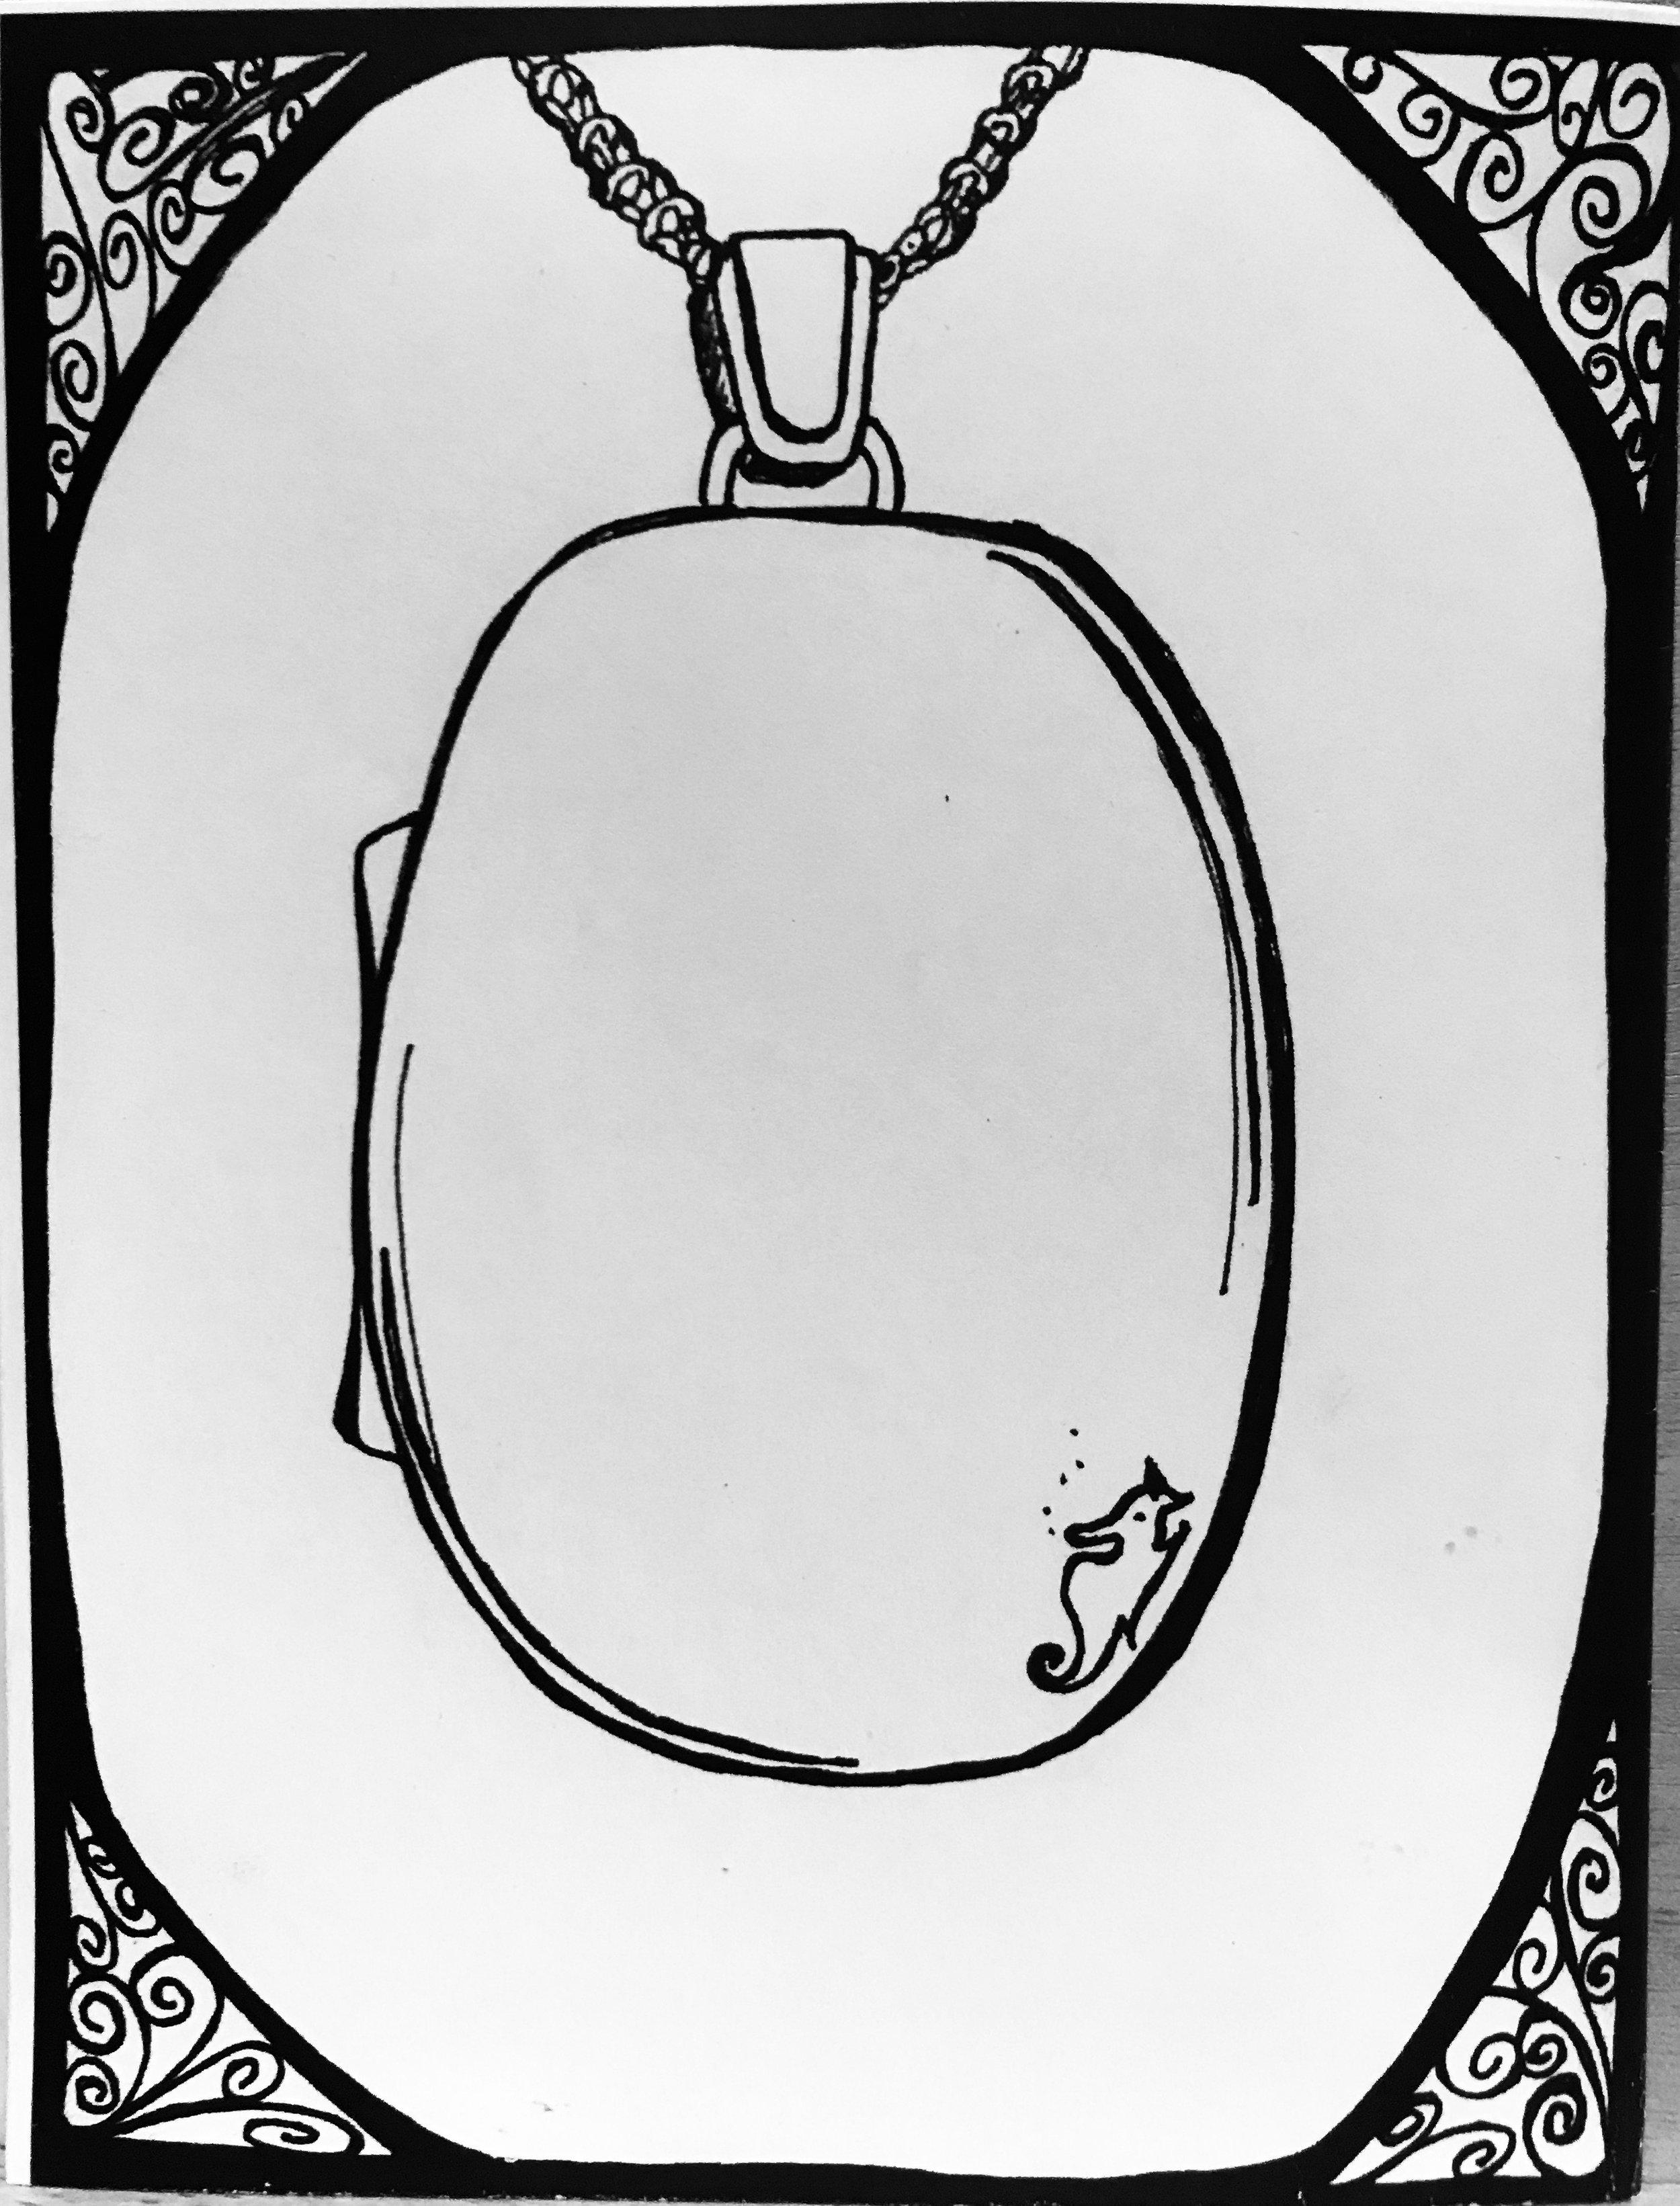 Valentine's Day Card (2008) / Back Panel